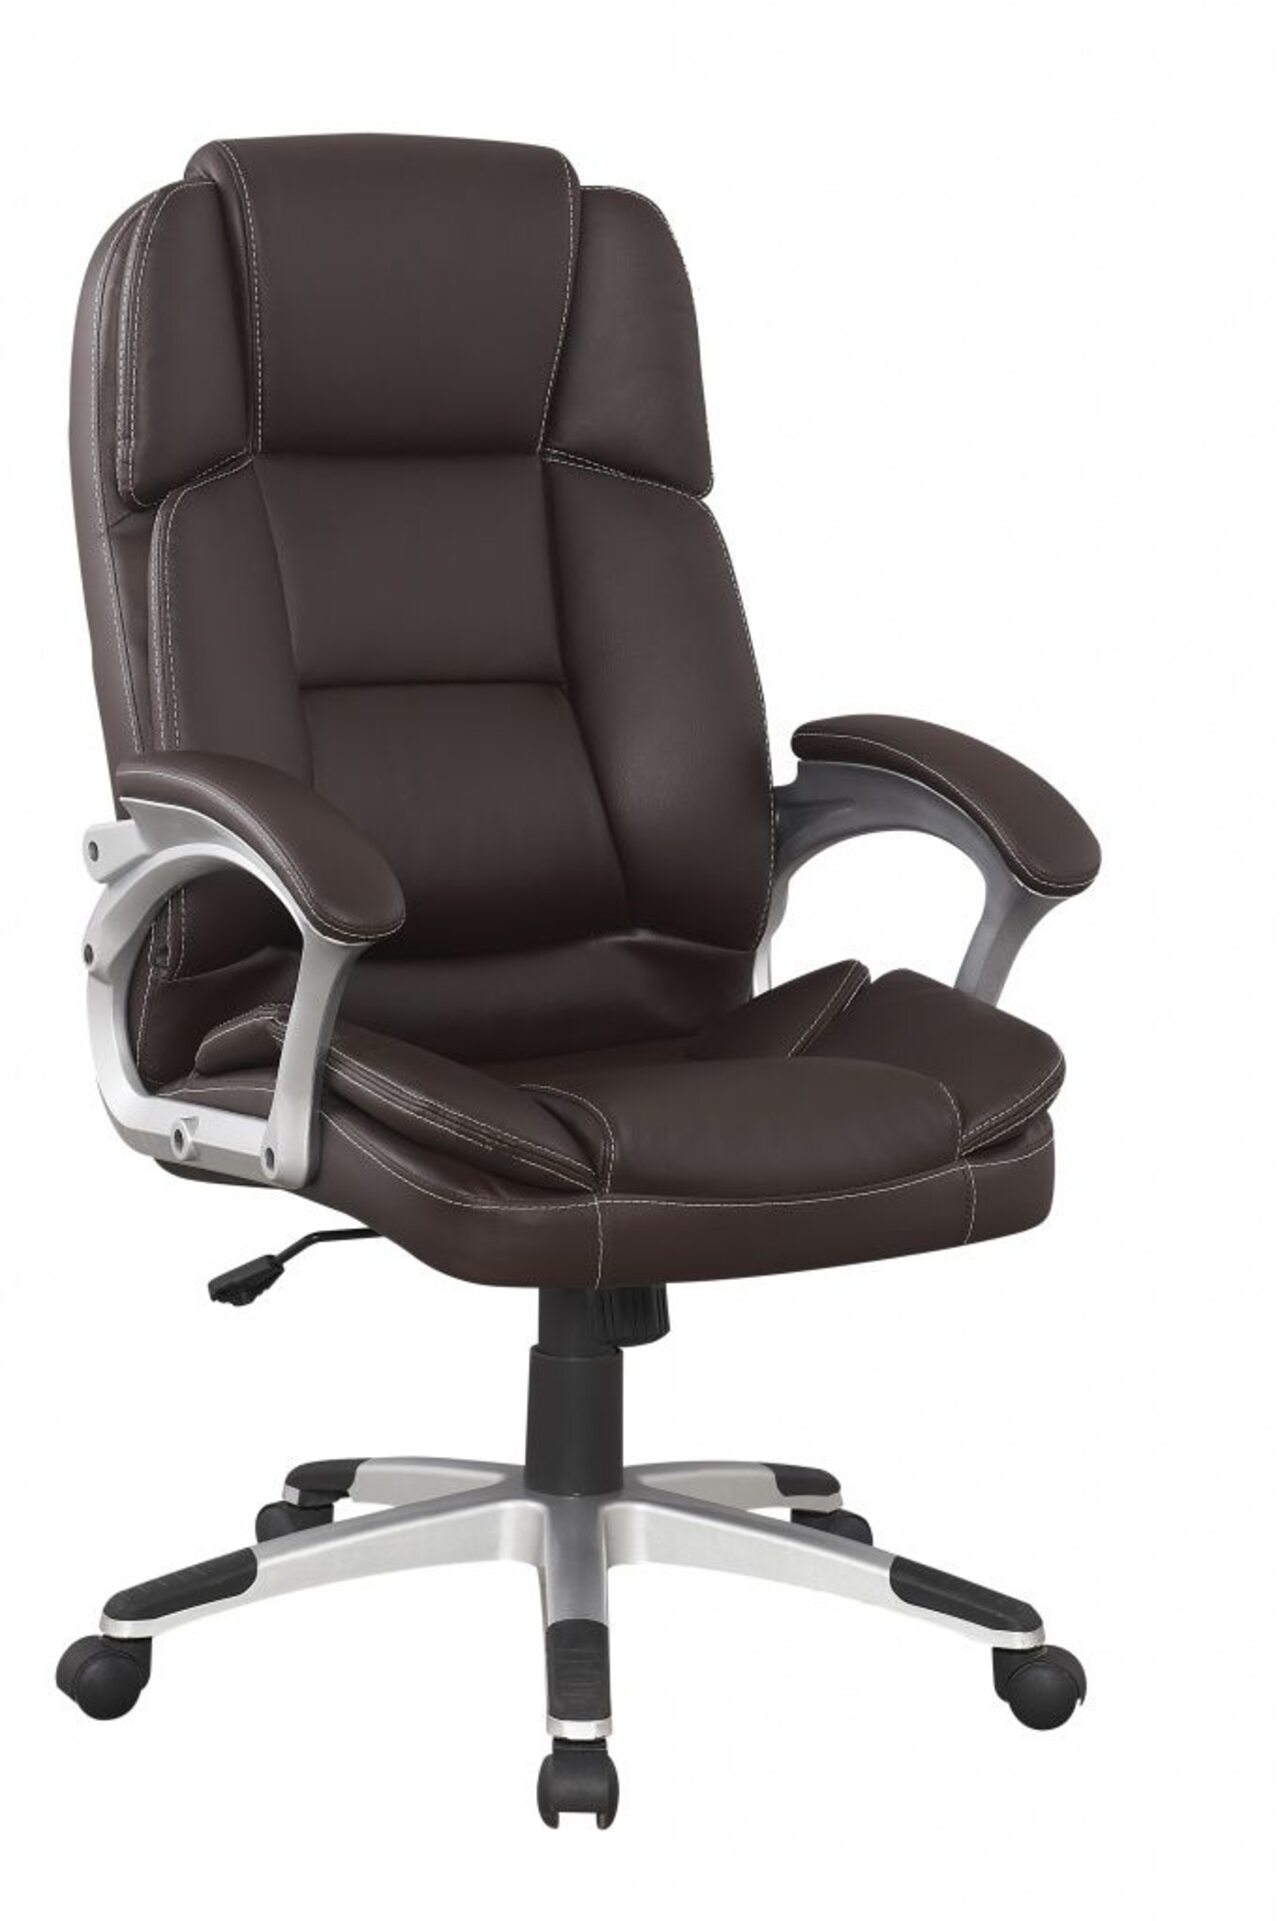 Кресло руководителя College BX-3323 - фото 5